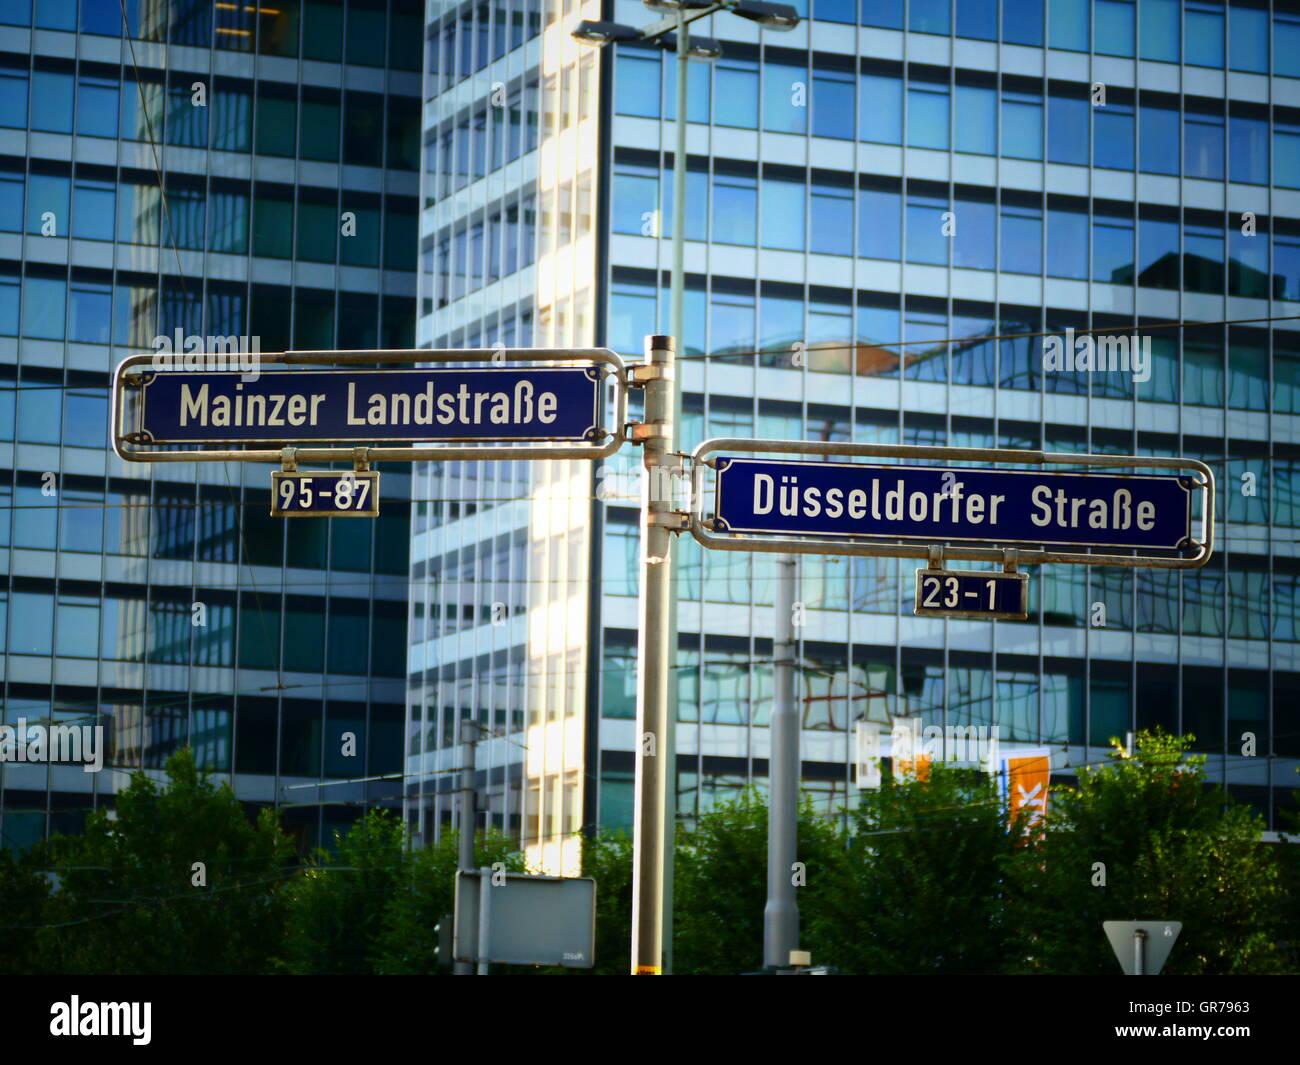 Street sign European financial city Frankfurt am Main Germany Europe Stock Photo